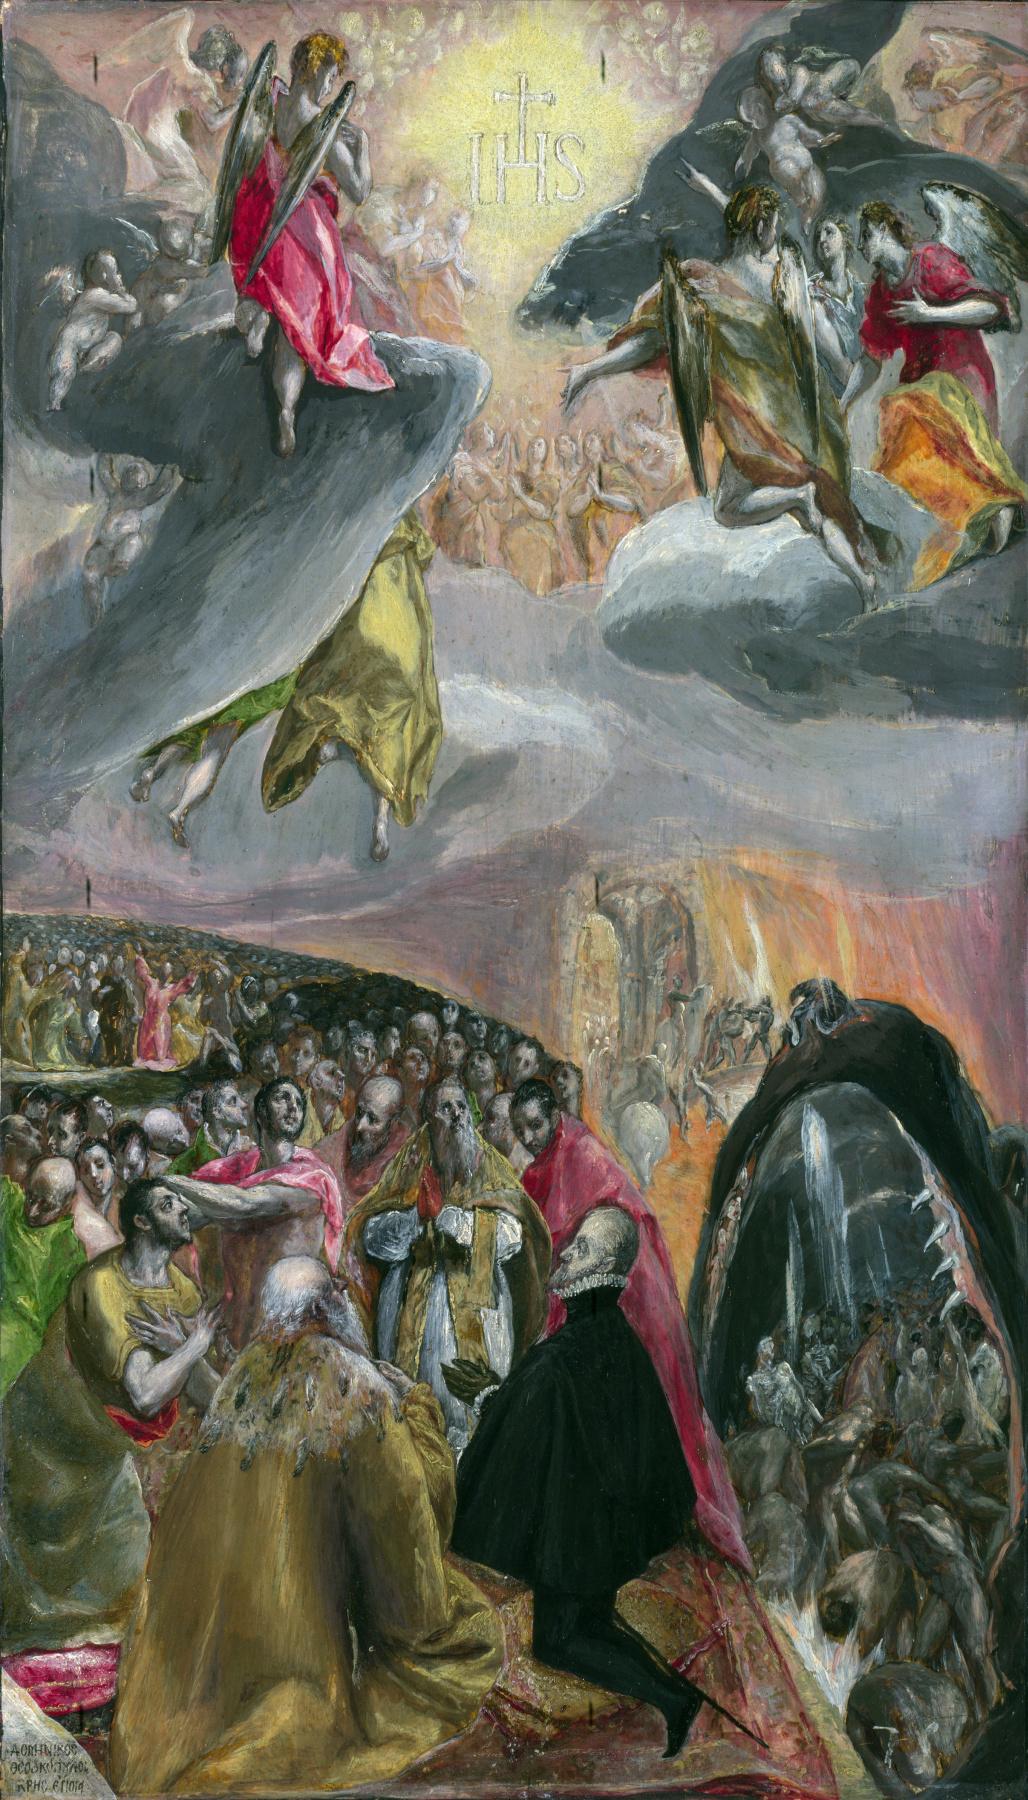 Domenico Theotokopoulos (El Greco). Worship the name of Jesus